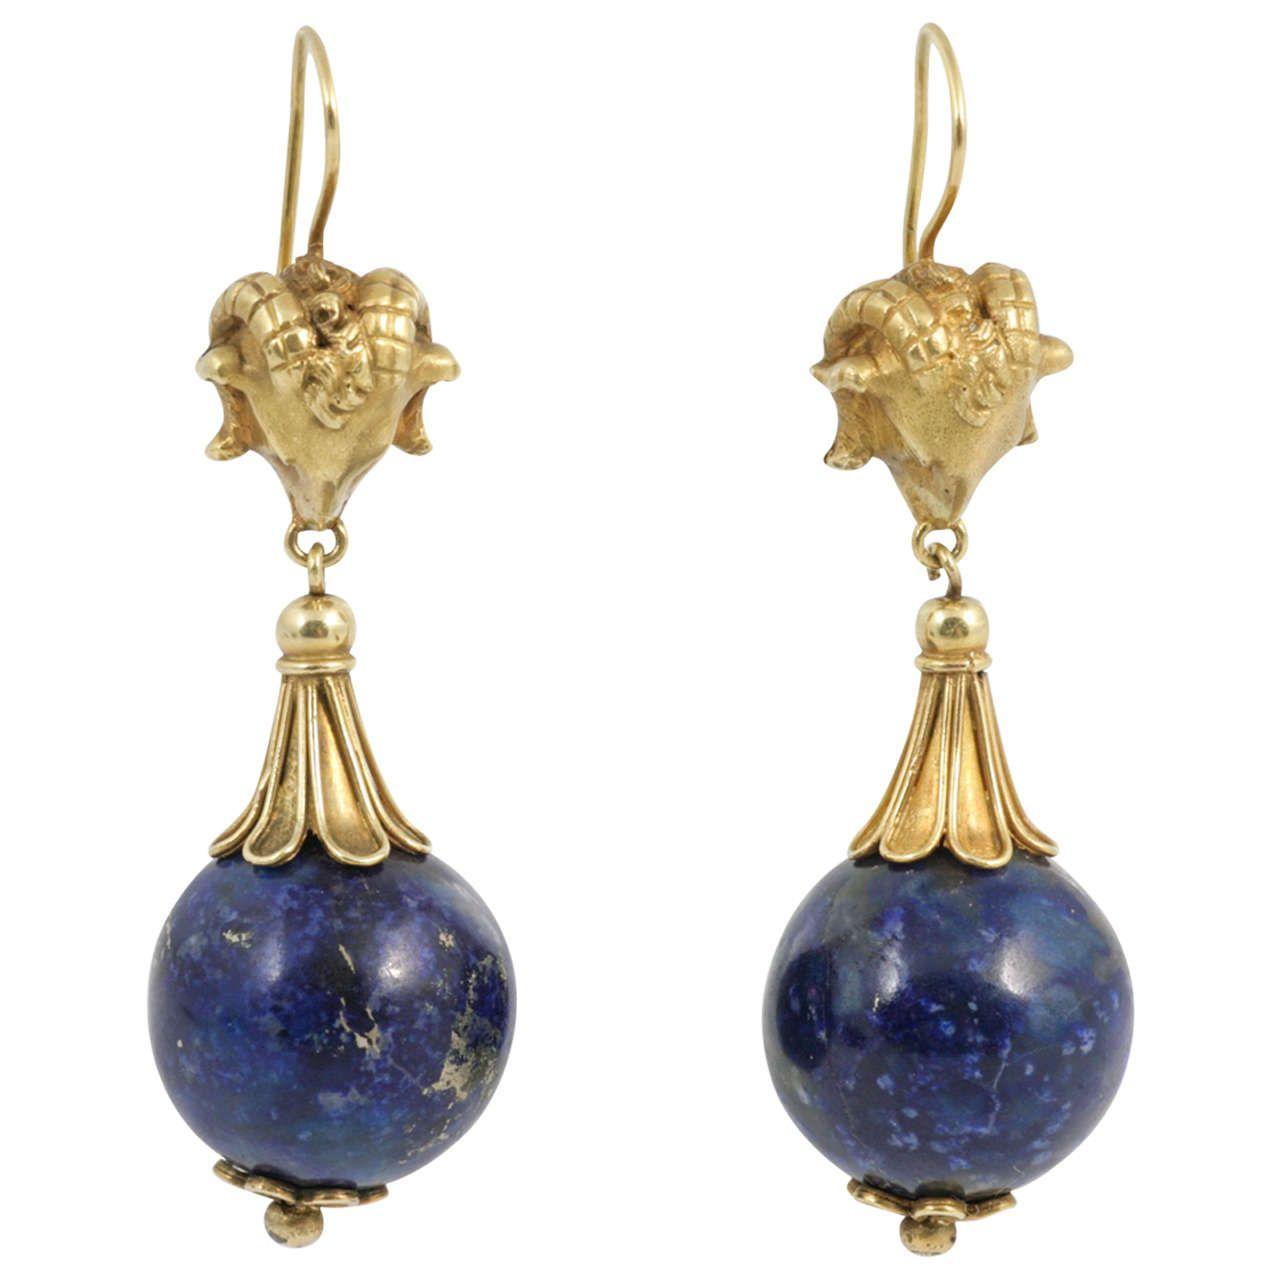 Stylish Lapis Lazuli Rams' Heads Drop Earrings | From a unique collection of vintage drop earrings at https://www.1stdibs.com/jewelry/earrings/drop-earrings/